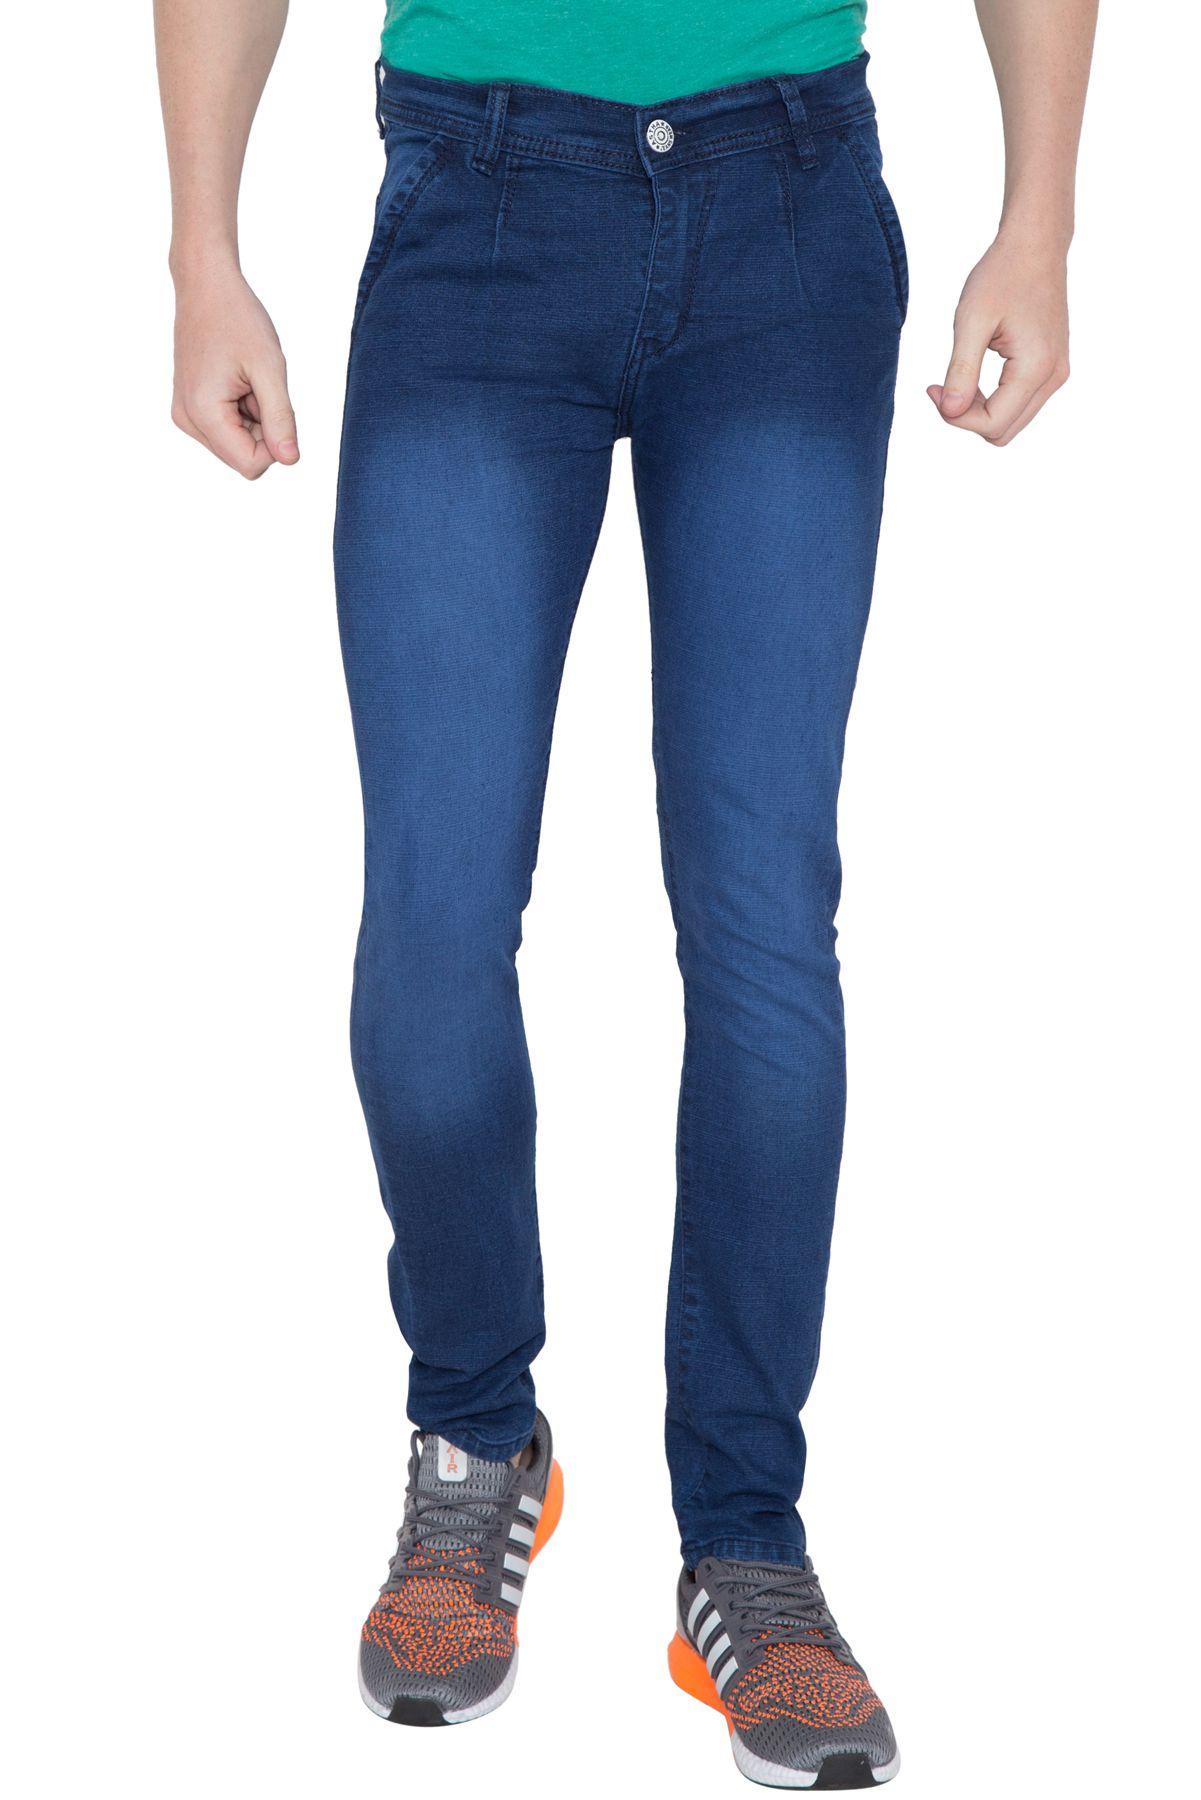 You Fashion Blue Slim Jeans